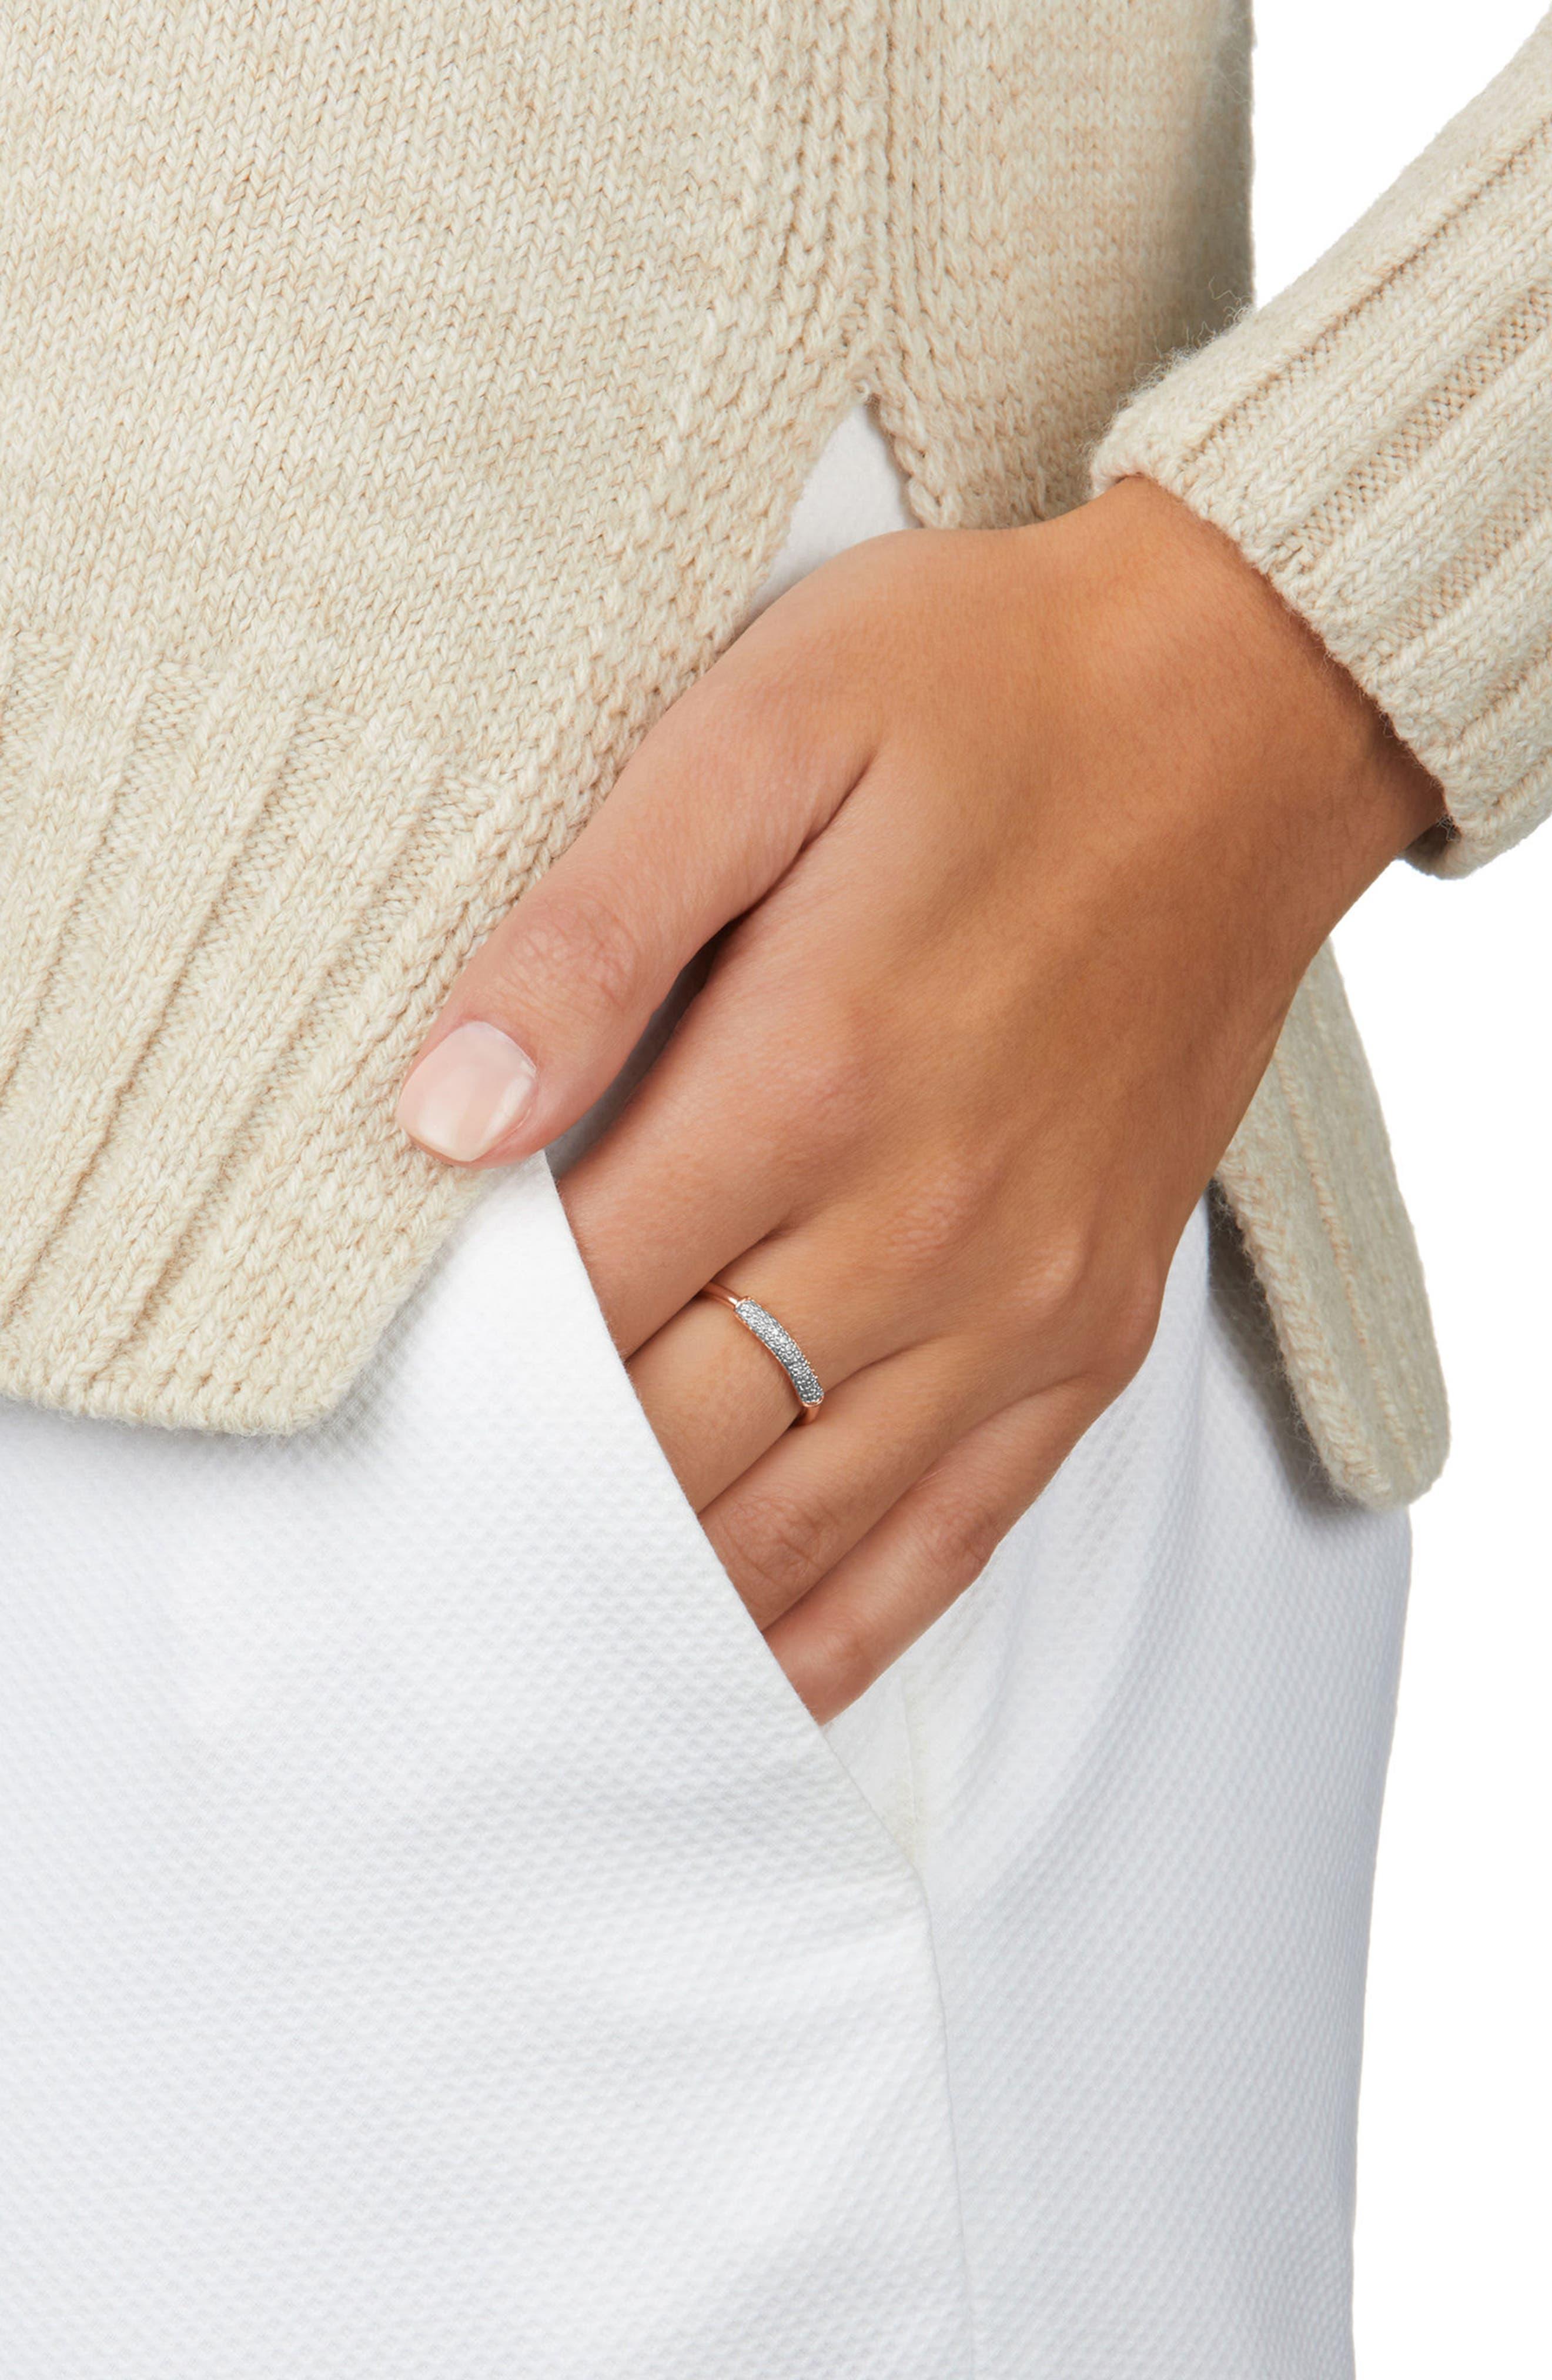 MONICA VINADER, Stellar Diamond Band Ring, Alternate thumbnail 2, color, GOLD